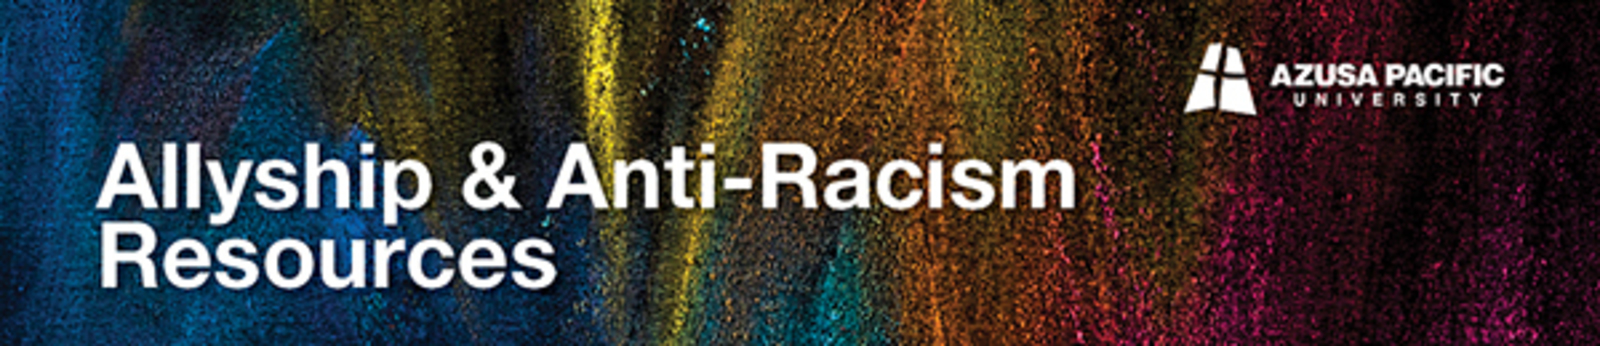 Allyship & Anti-Racism Resources